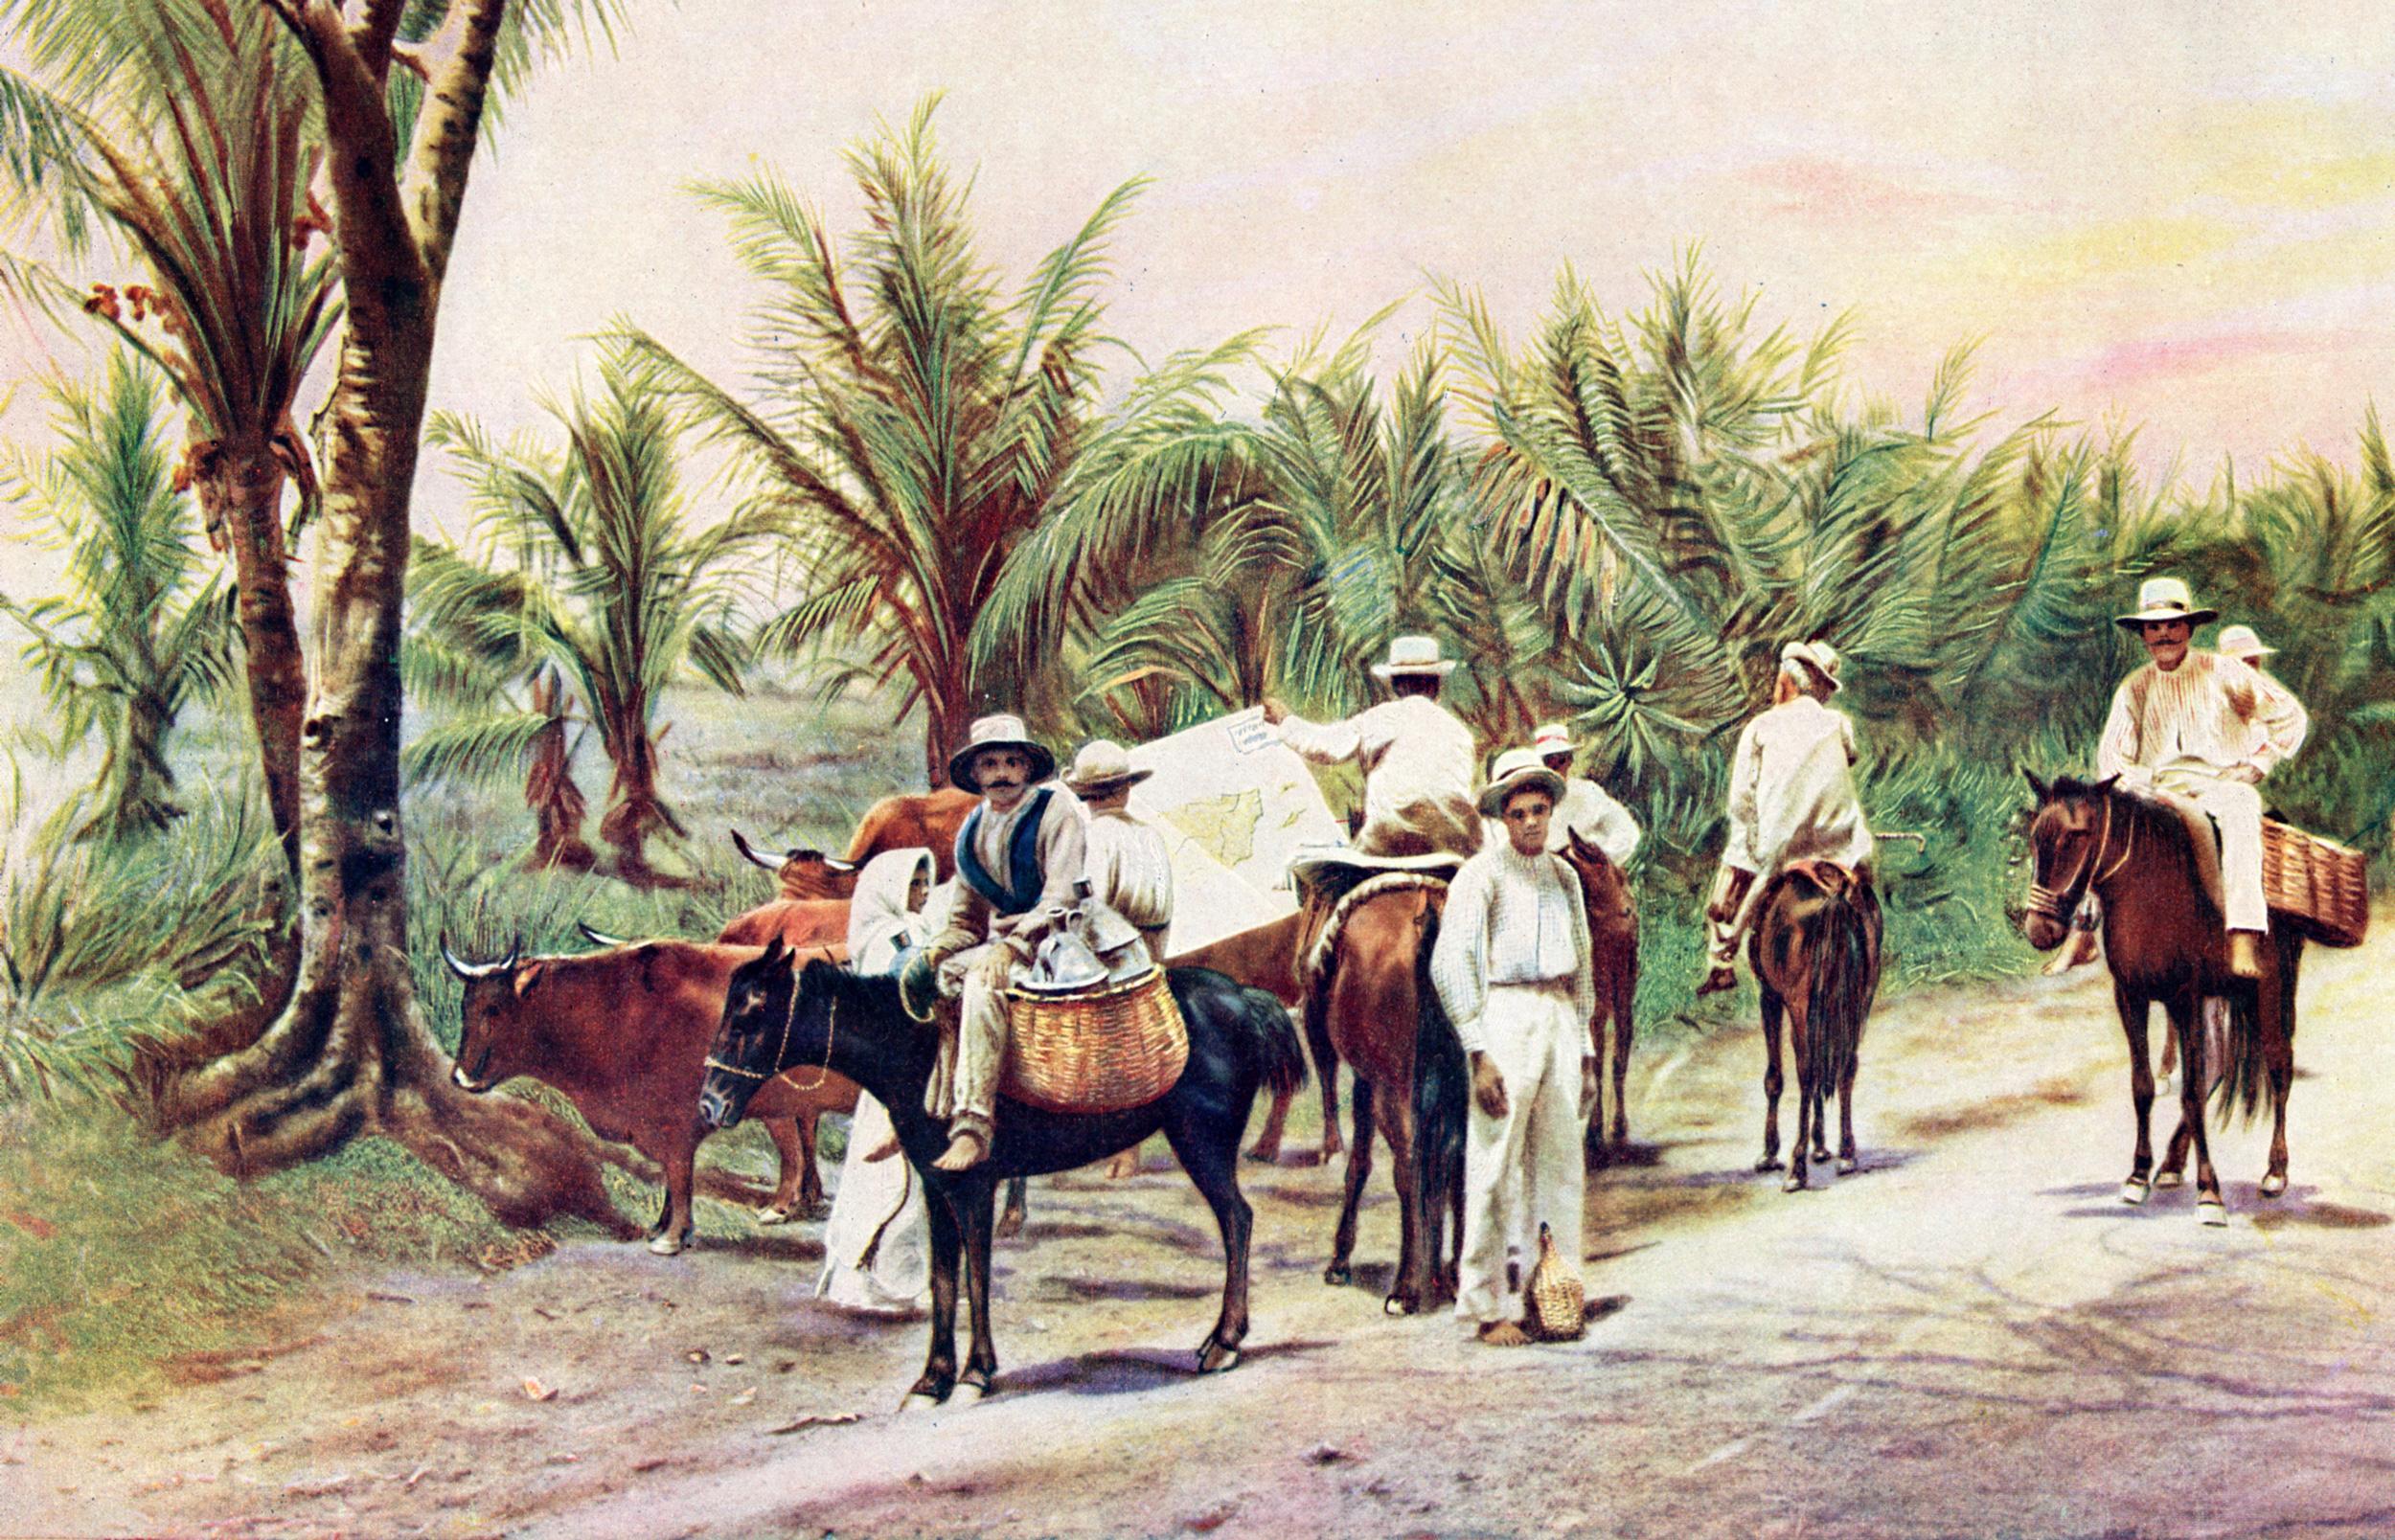 Antique prints of Puerto Rico & Cuba